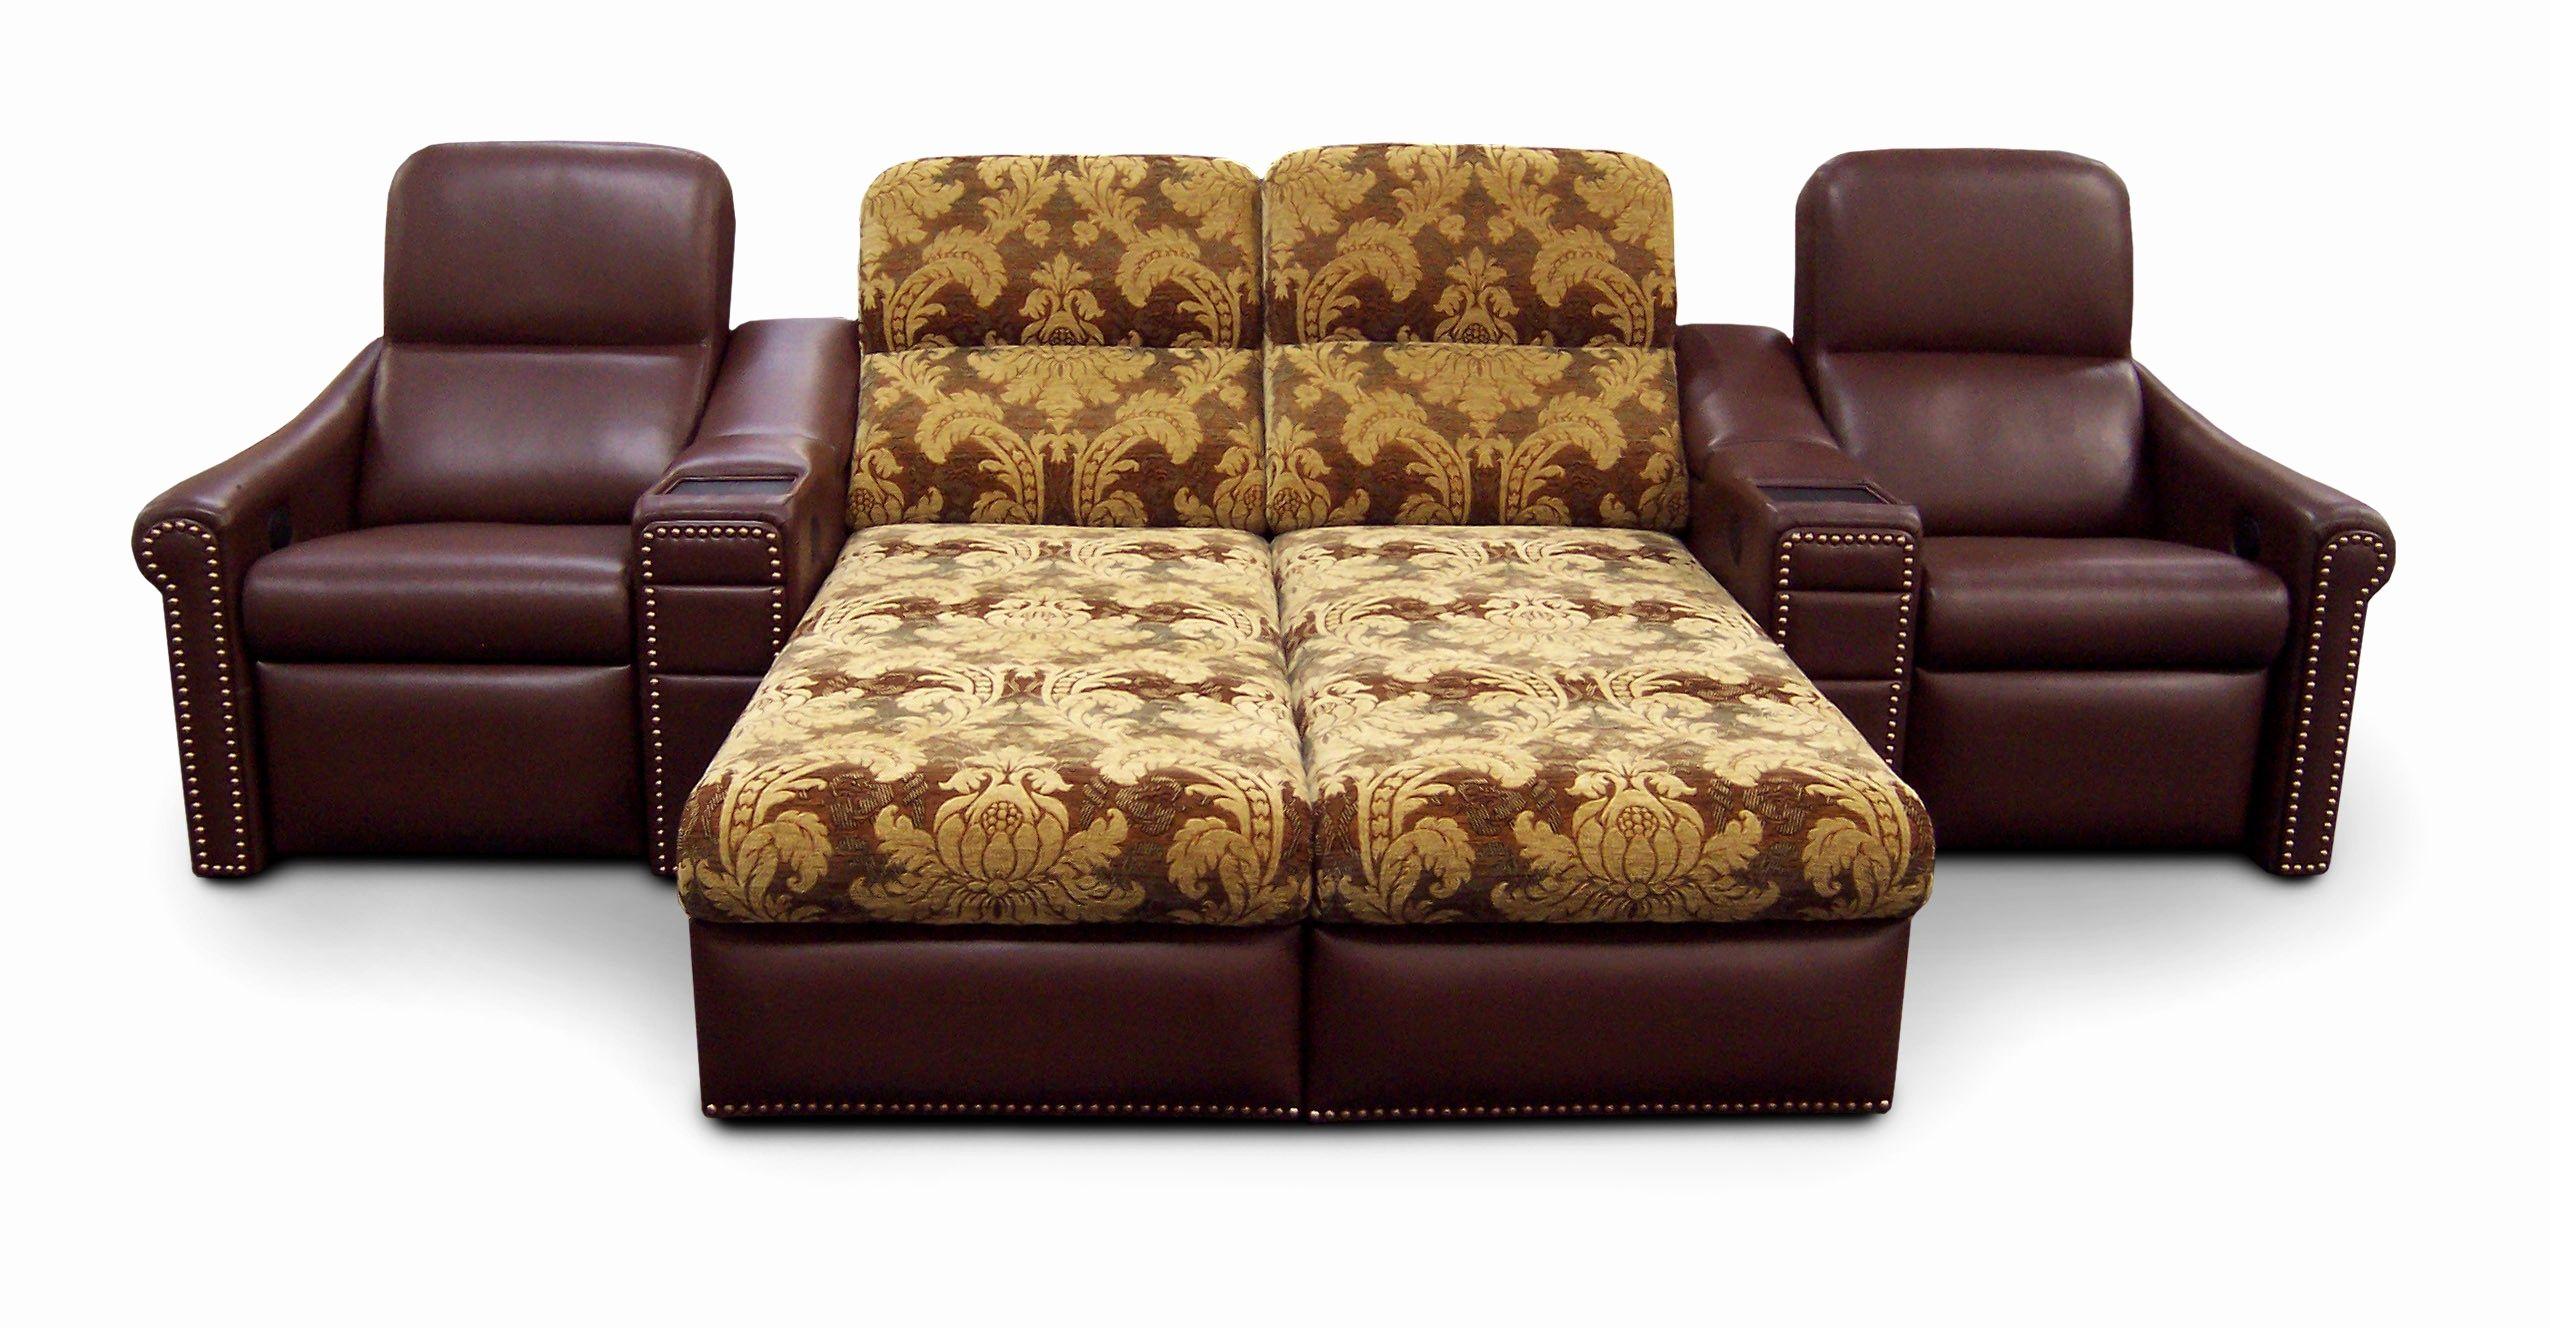 Elegant Chaise Lounge Sleeper Sofa Shot Chaise Lounge Sleeper Sofa